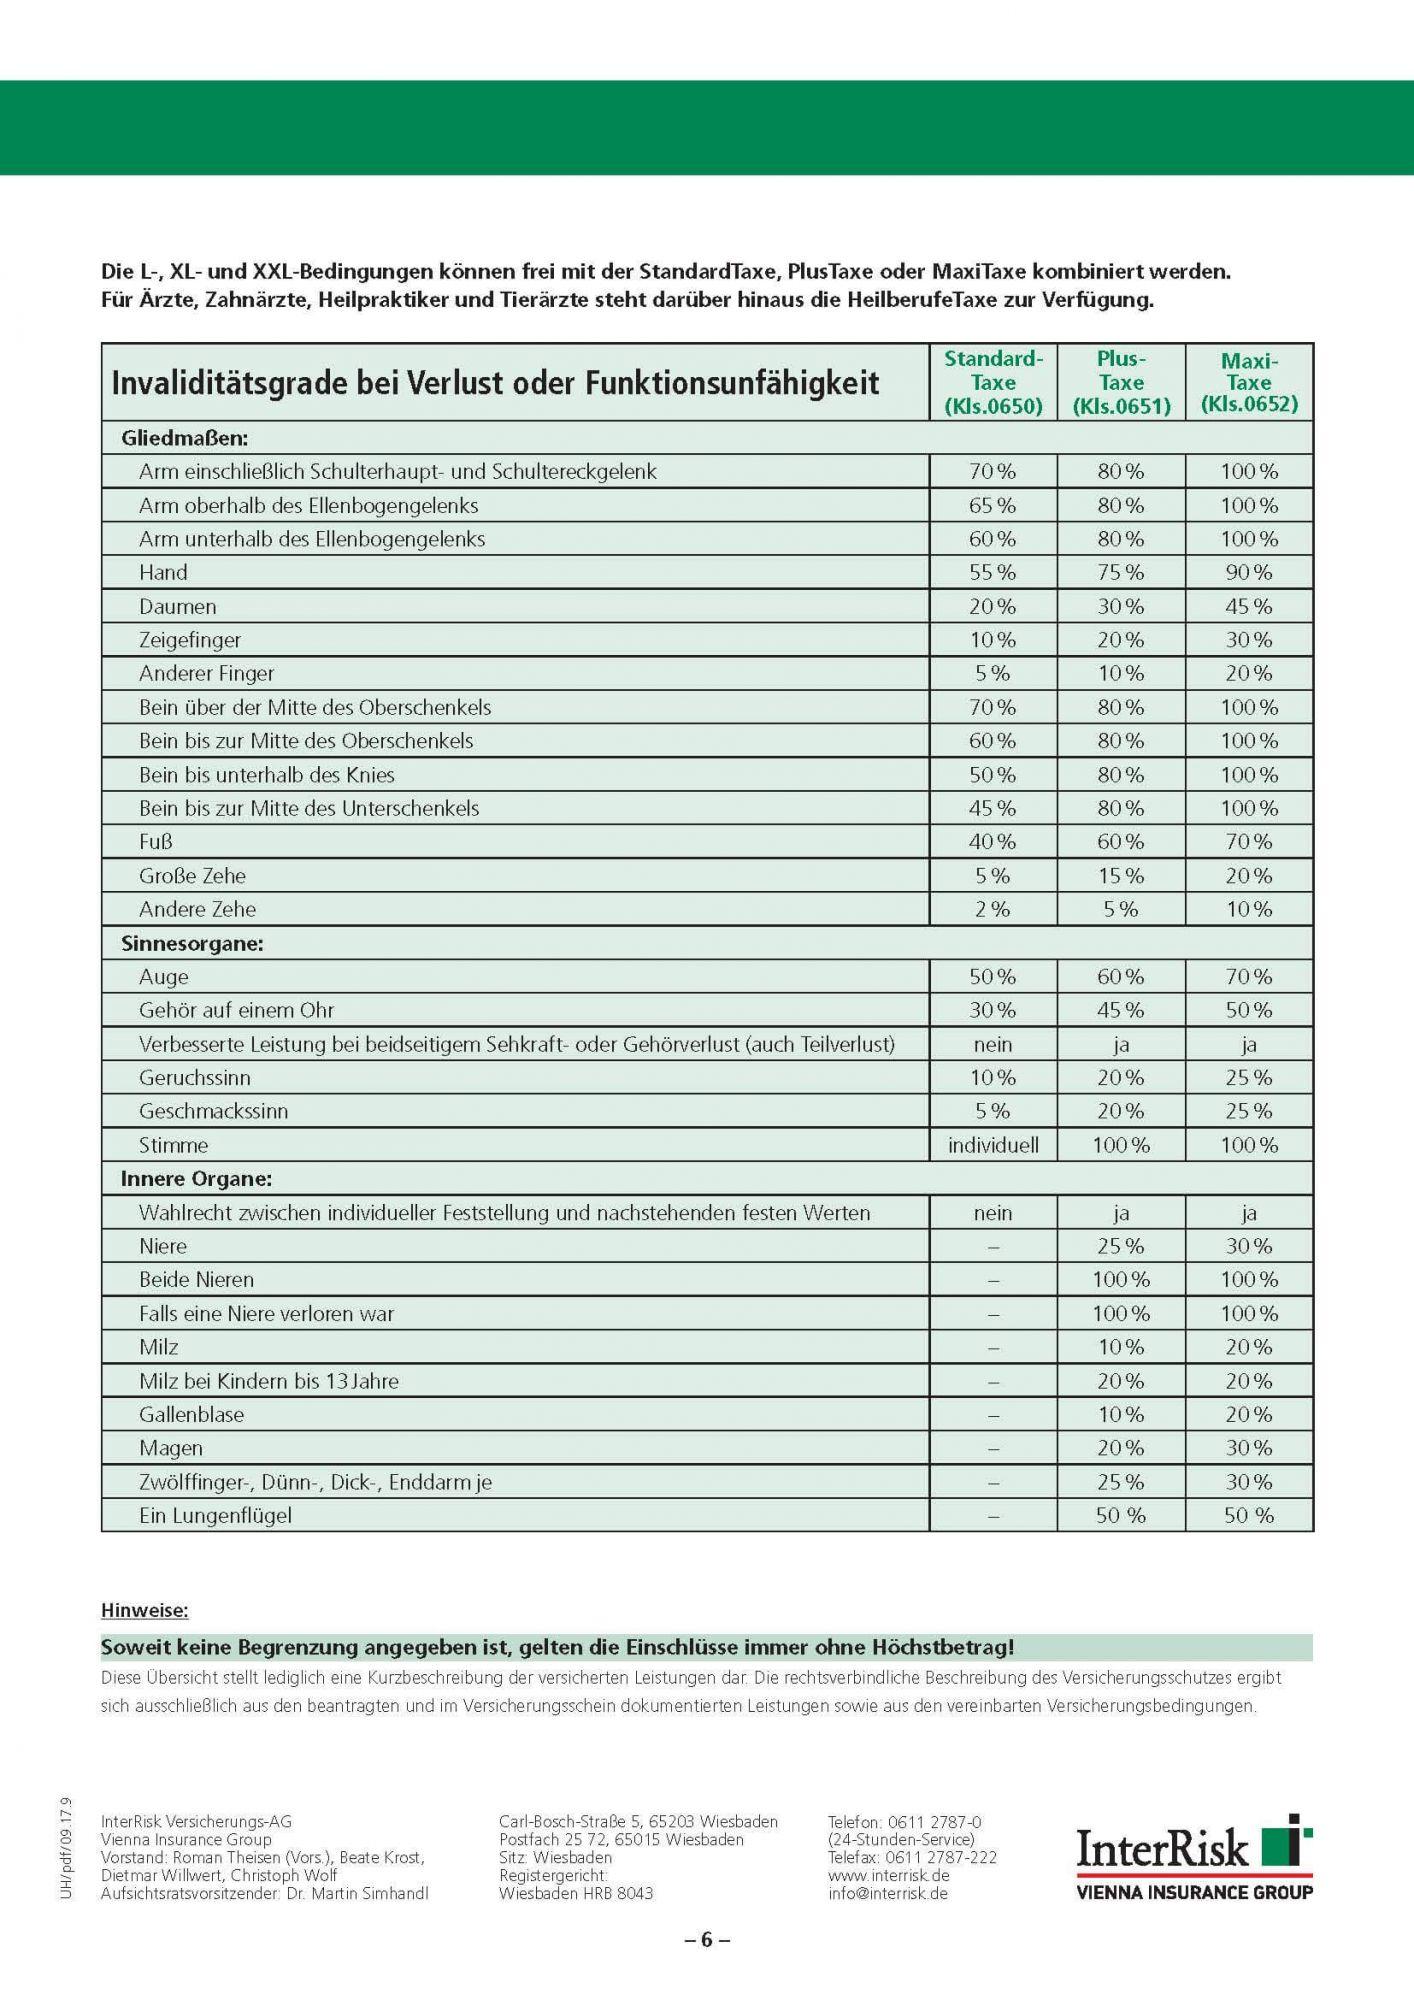 Beste Unfallversicherung Interrisk Tarife Plus Taxe & Maxi Taxe